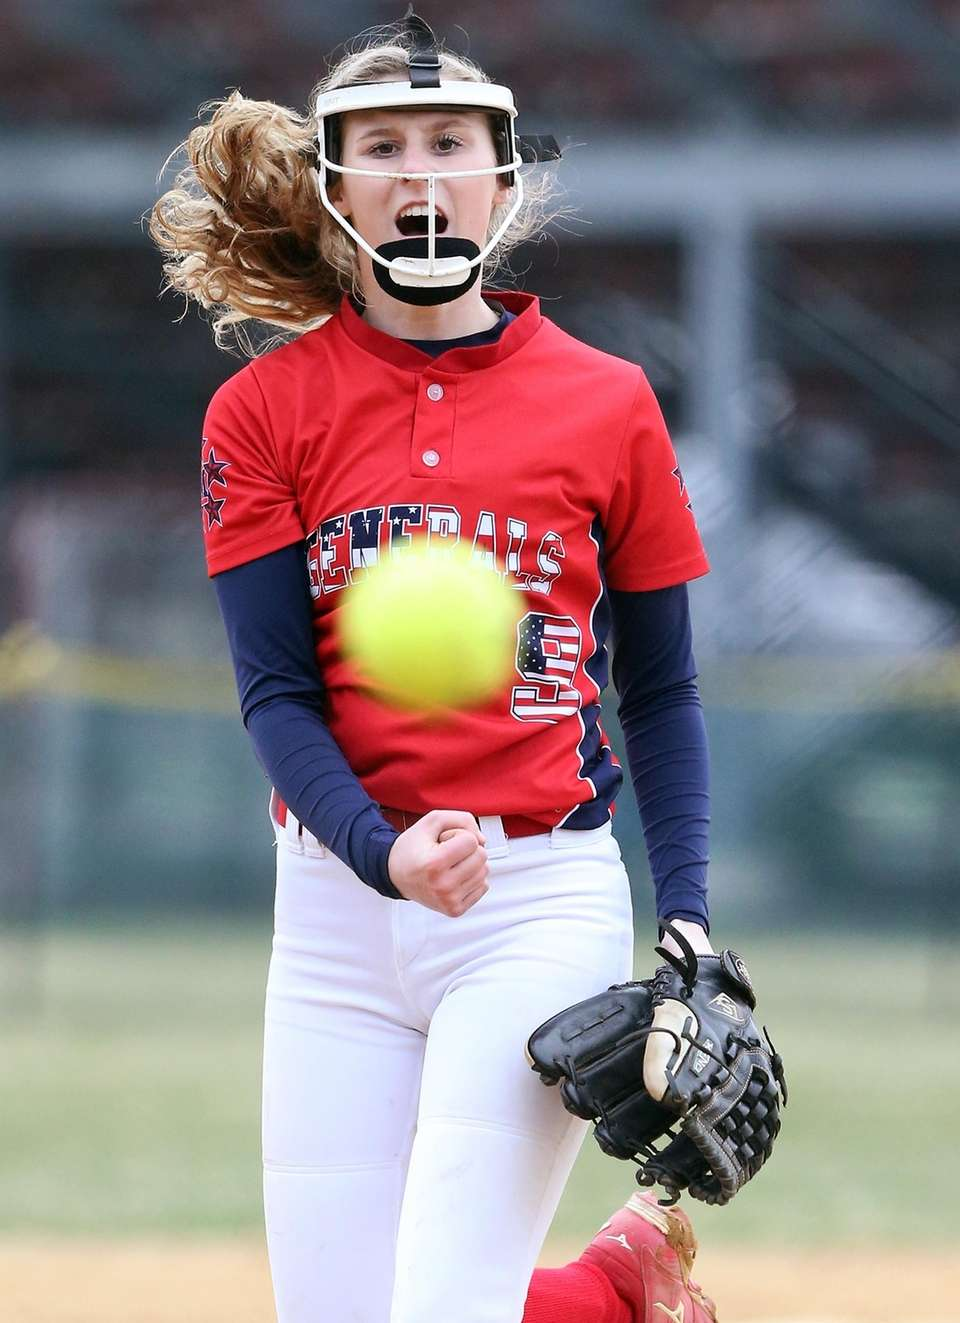 MacArthur's winning pitcher Jessica Budrewicz brings it to